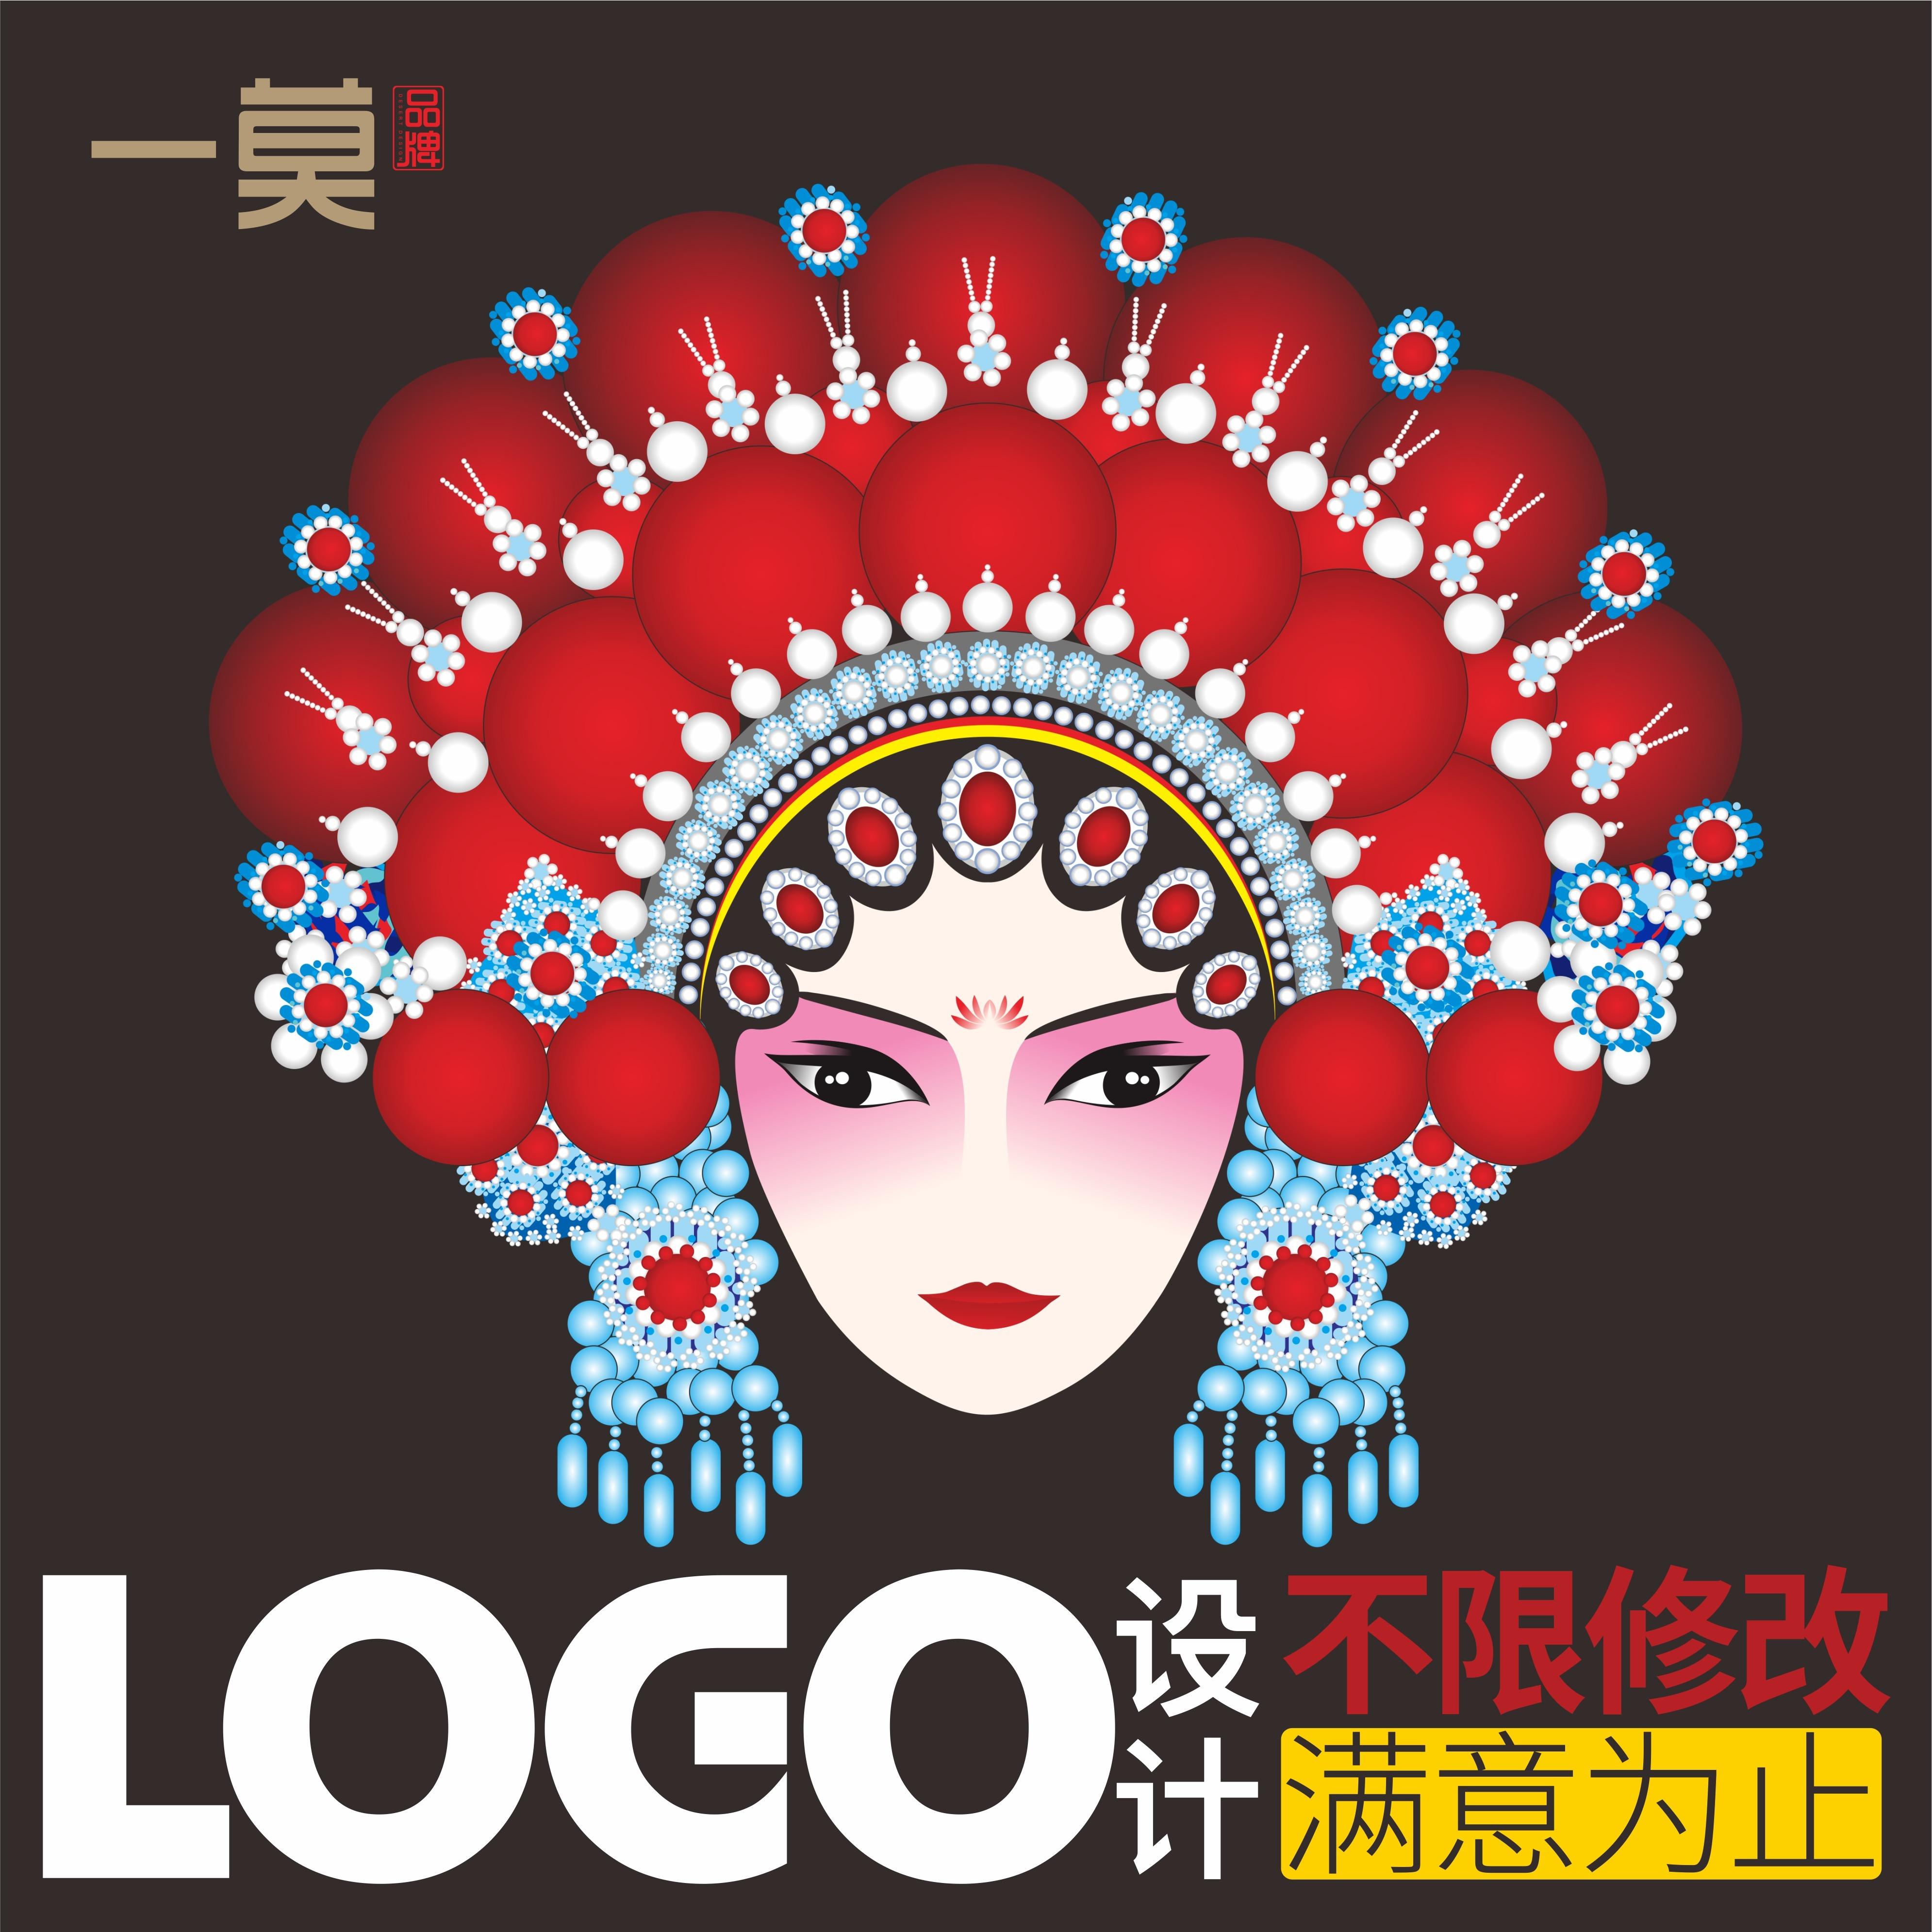 【LOGO设计】企业logo设计门店logo商标卡通手绘